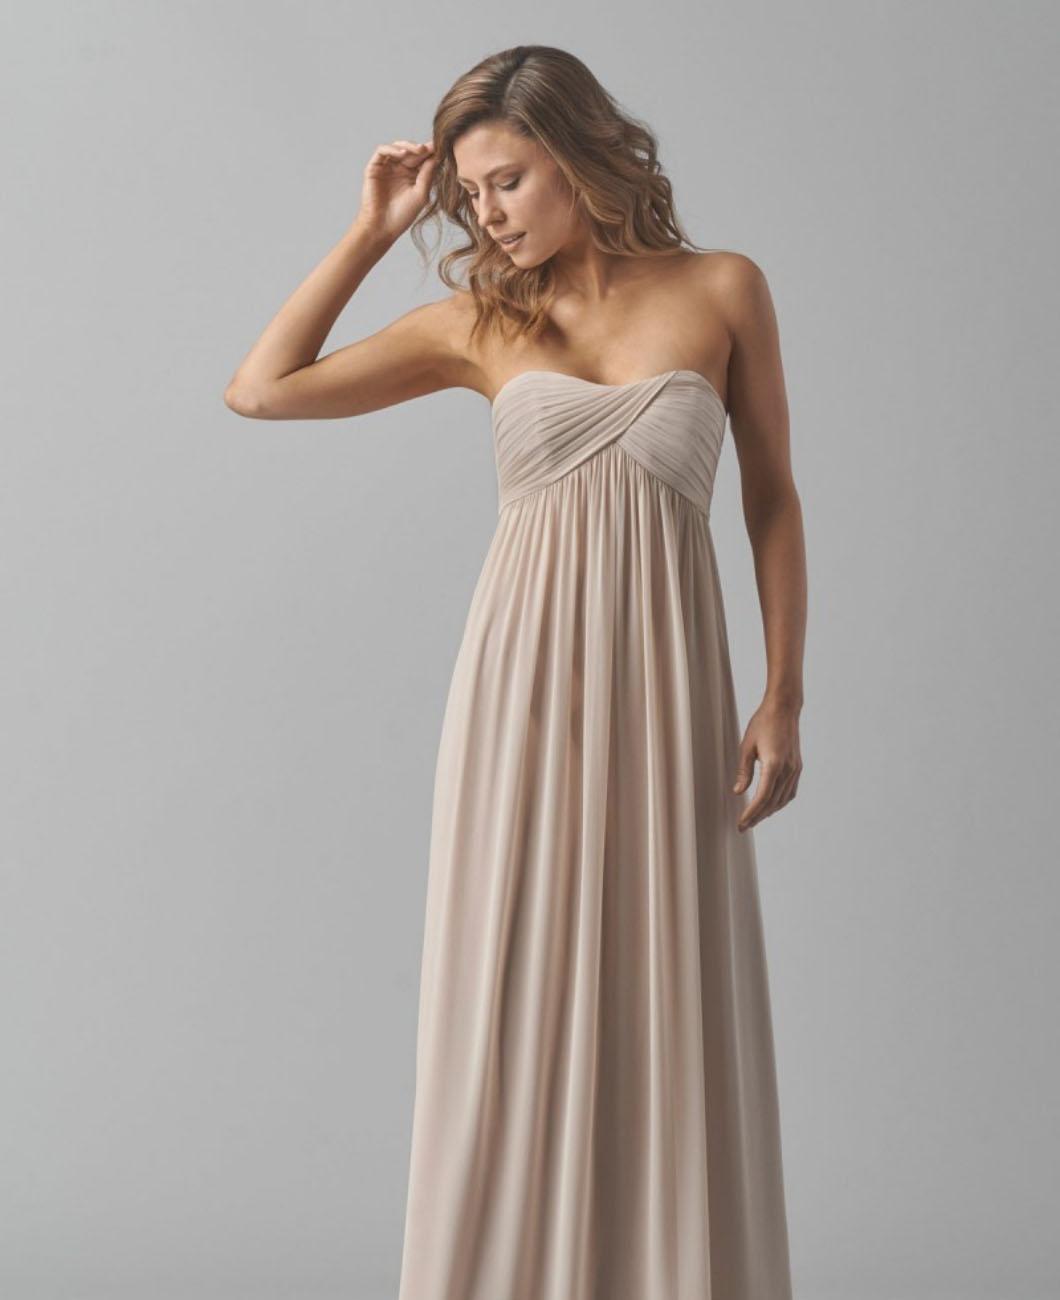 empire-waist-silhouette-la-polo-lapolo-fashion-trend-gown-high-waisted